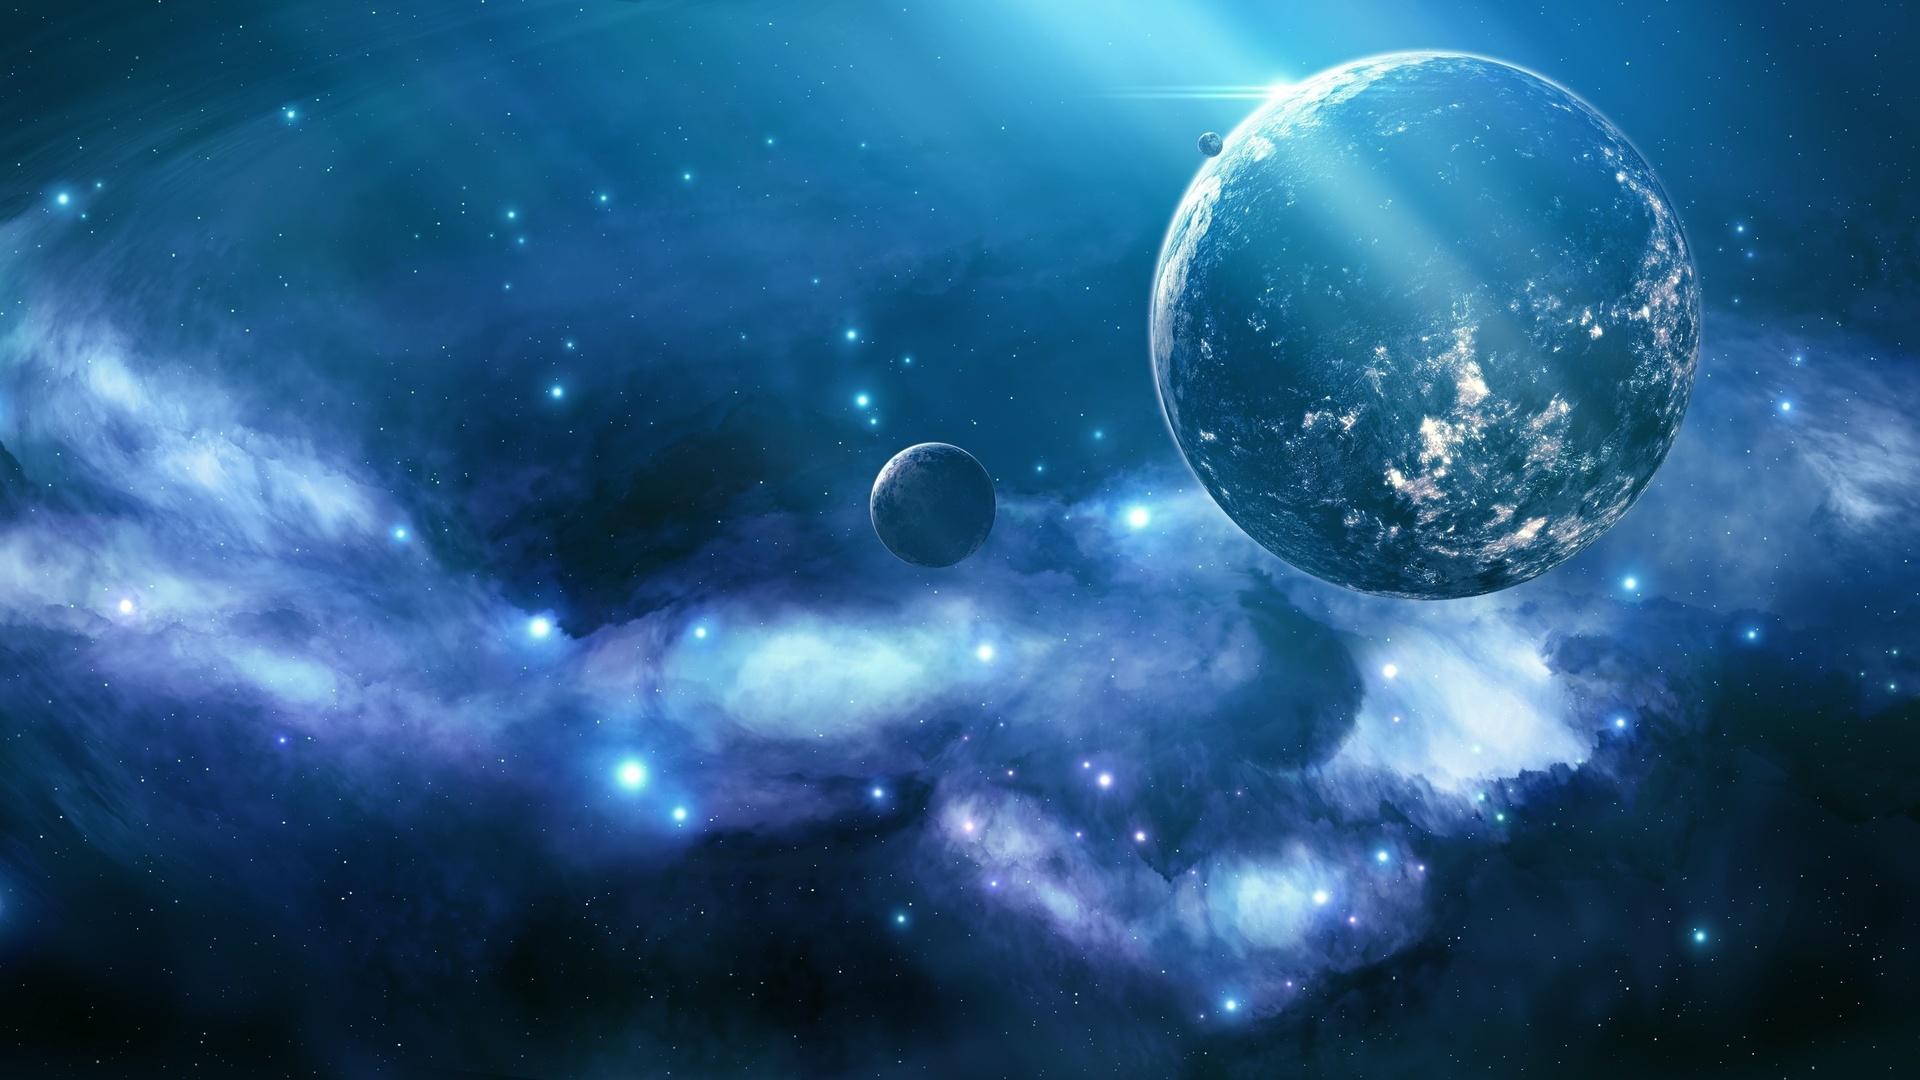 Blue nebula, unknown planet, космос, сияние, звёзды, туманность